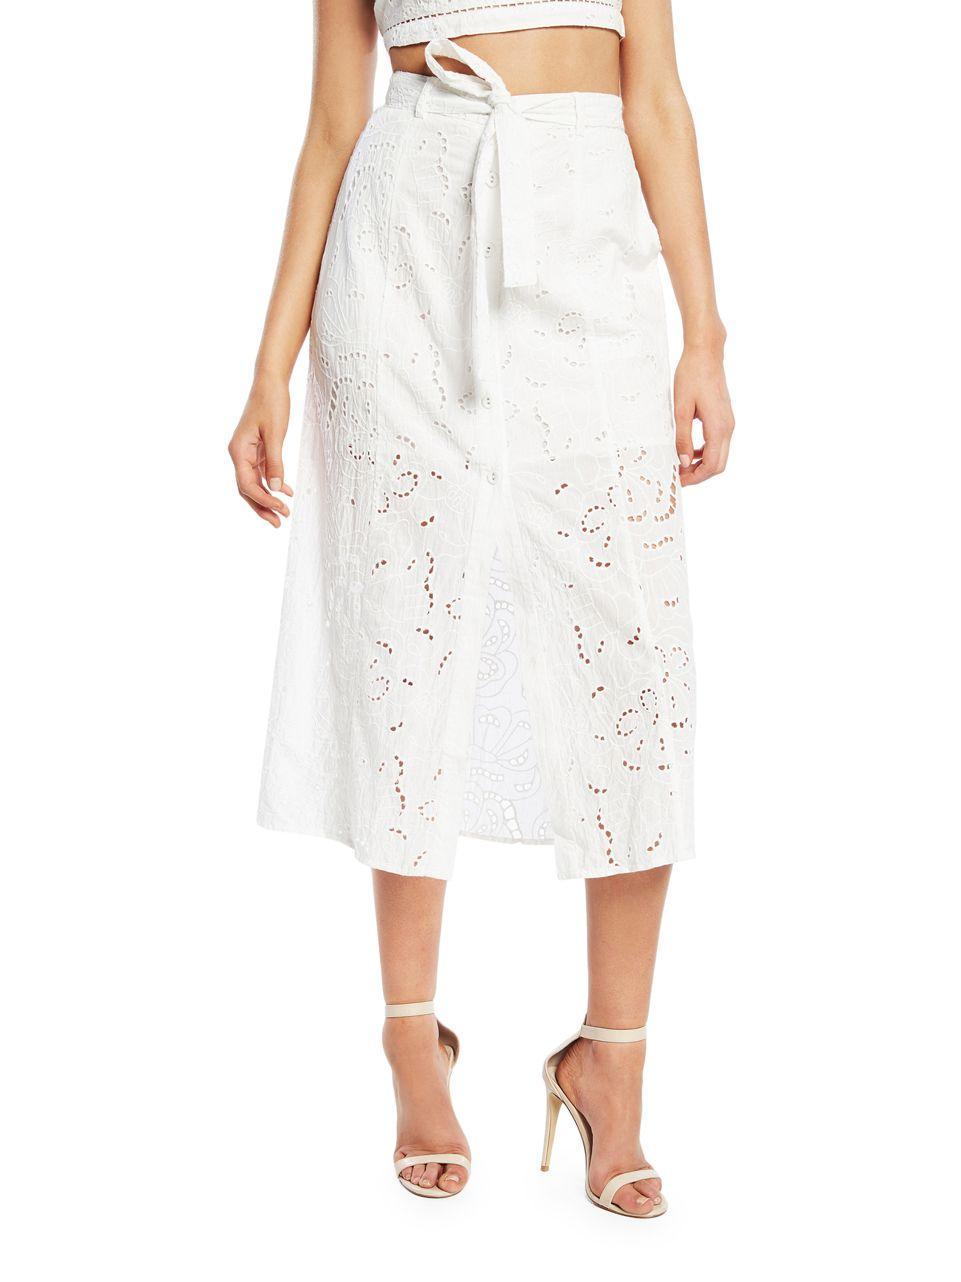 b8299d5bdb33 Bardot Meadow Cutout Cotton Skirt in White - Lyst